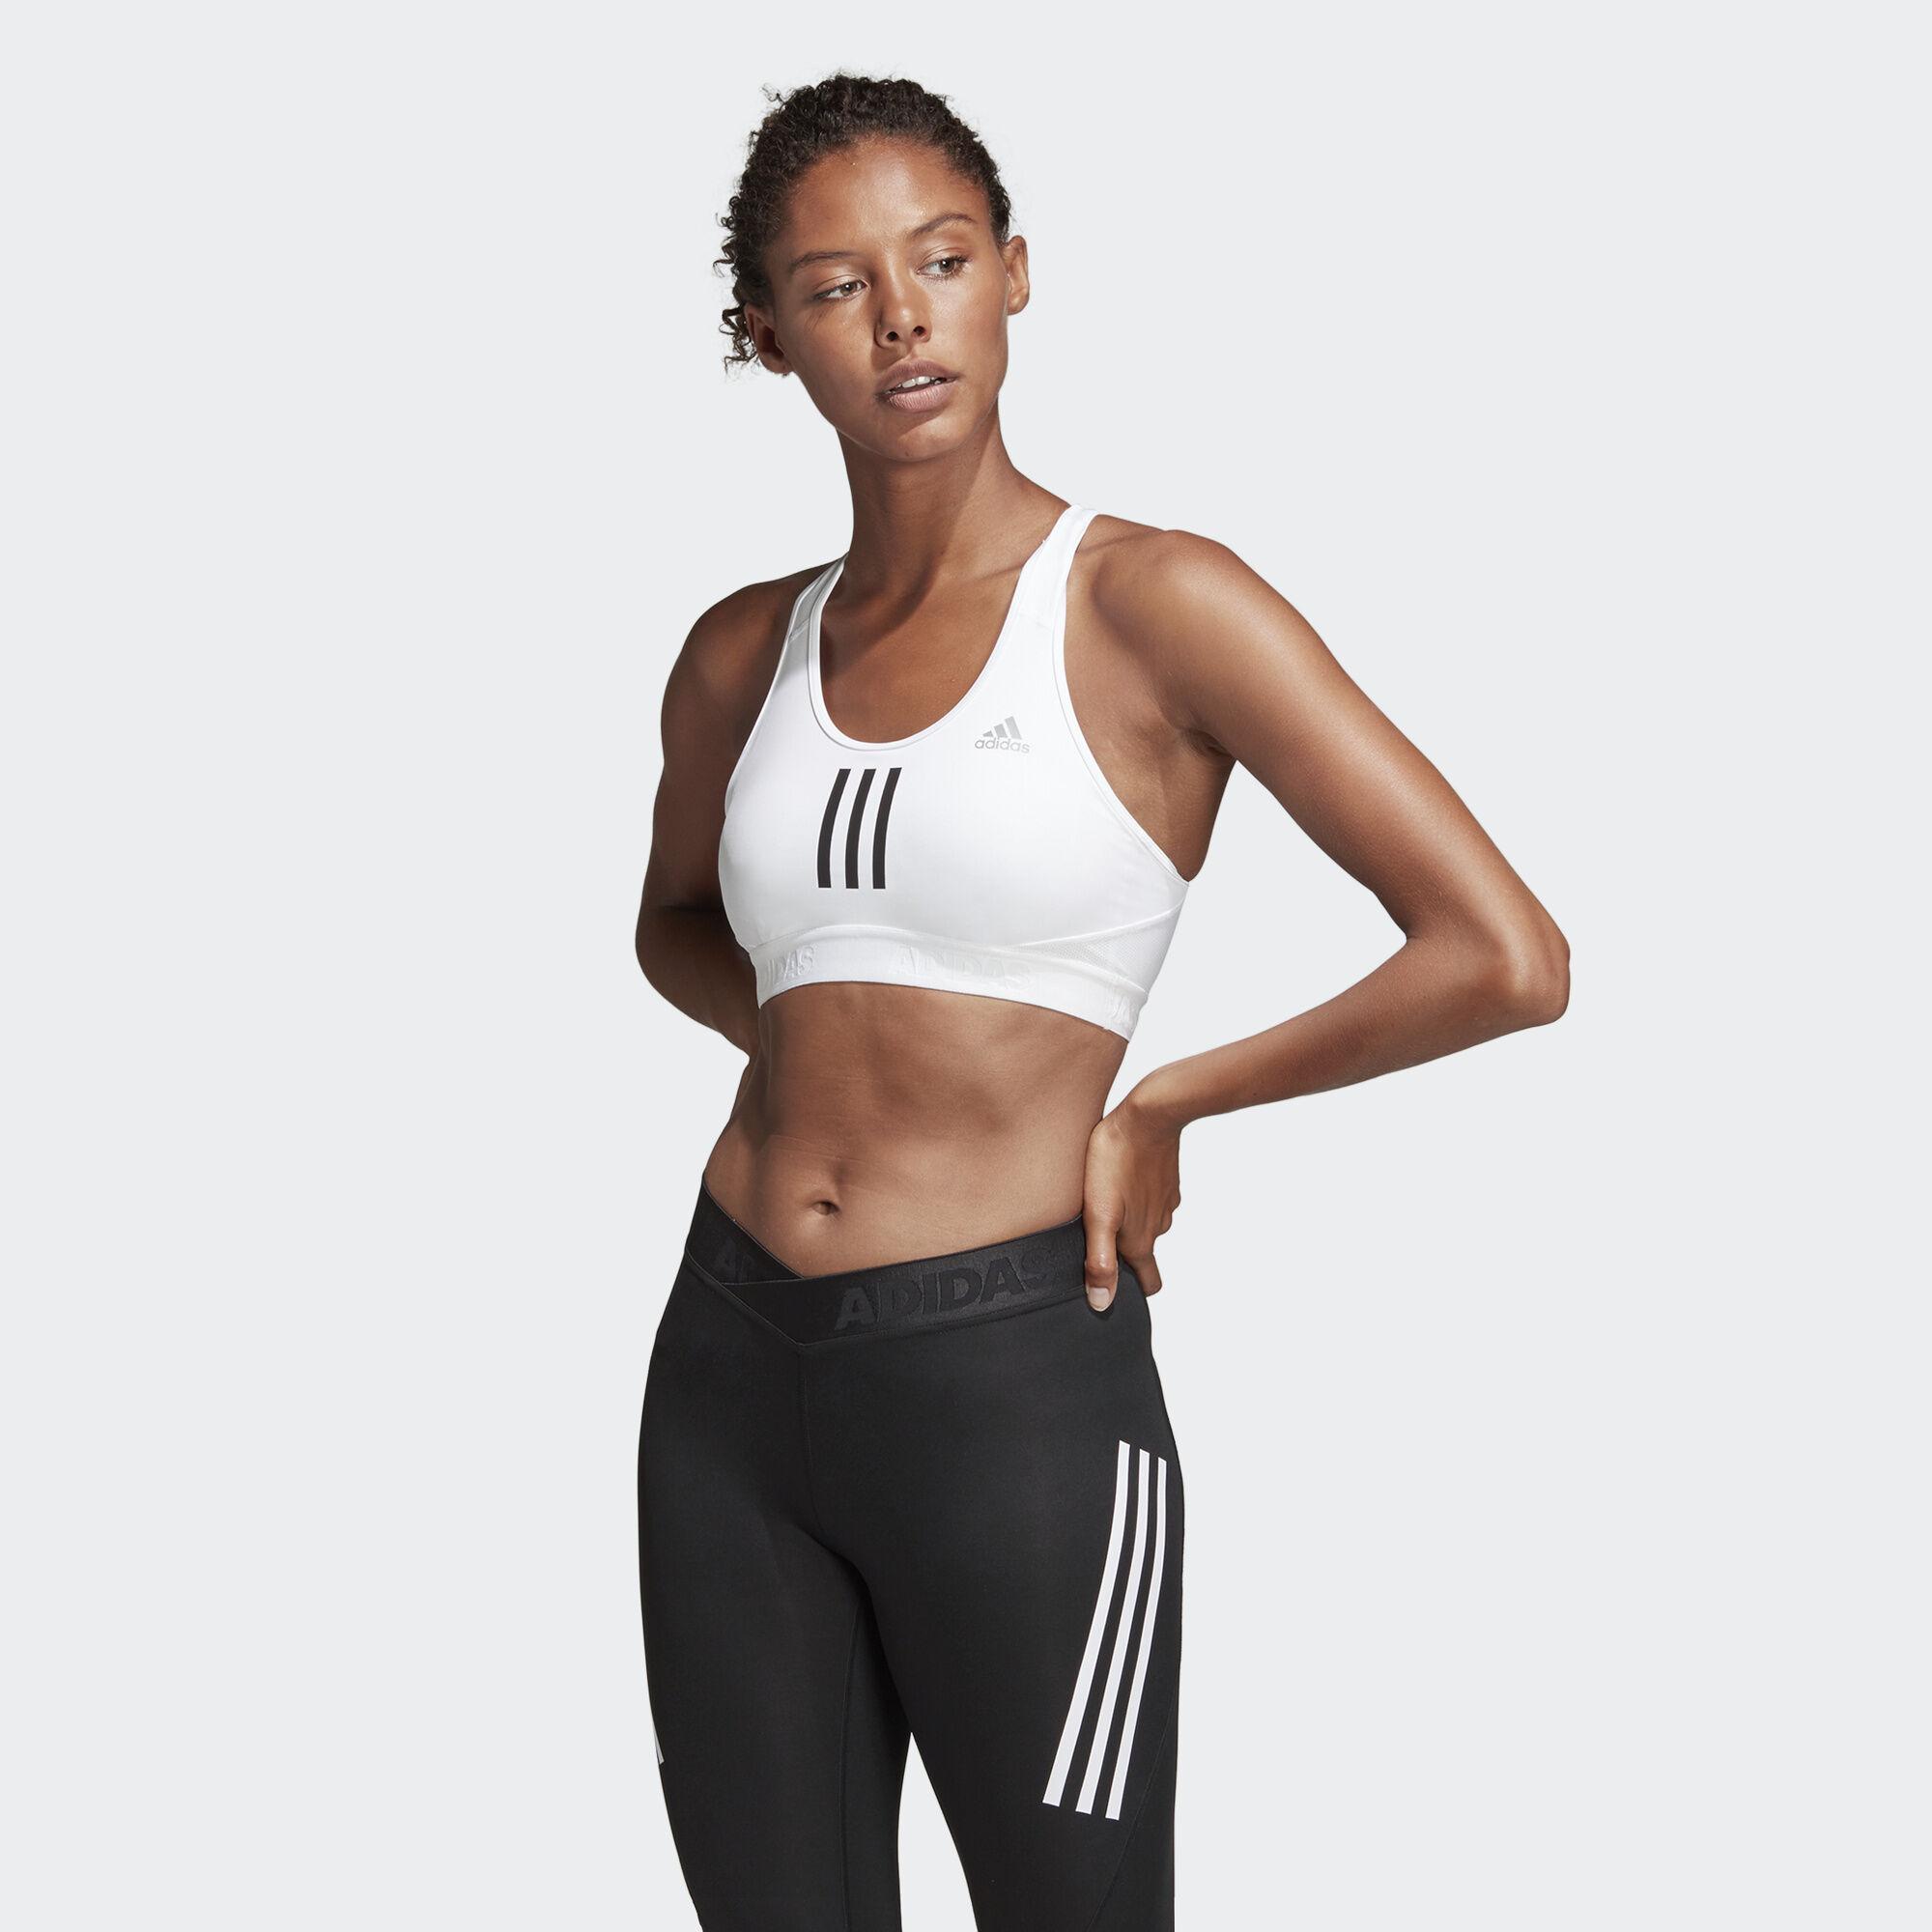 ec9647f7d4 adidas - Don t Rest Alphaskin Sport+ Padded 3-Stripes Bra White DT4027